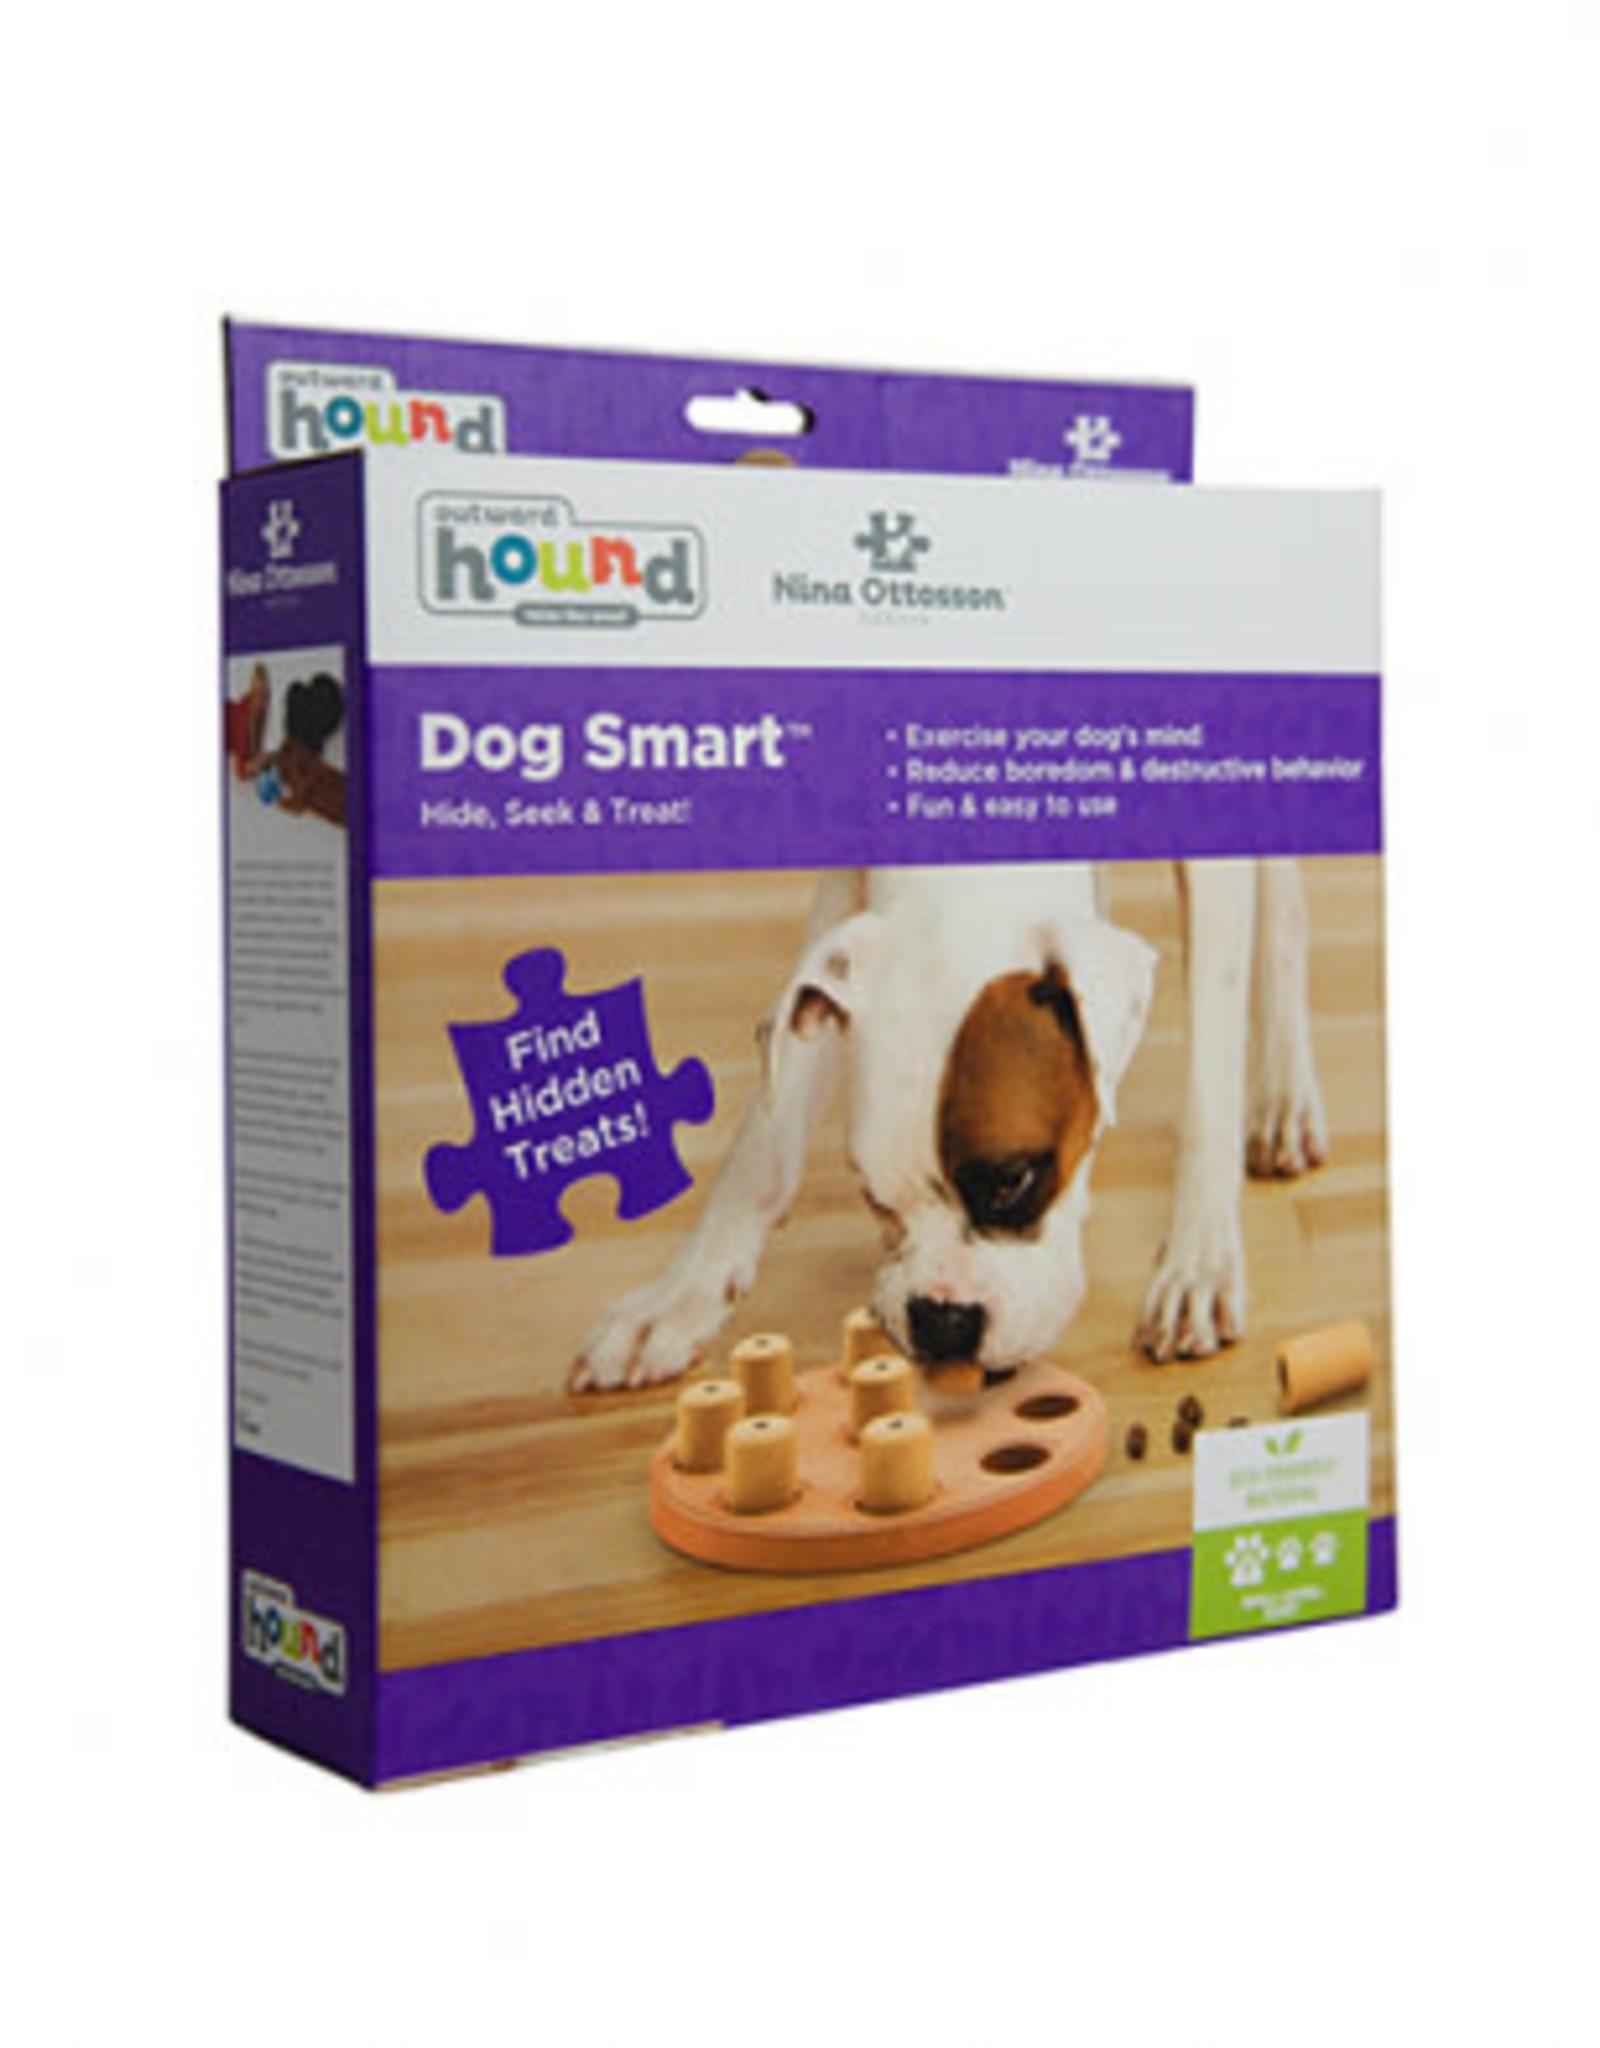 Outward Hound Dog Smart Composite Dog Puzzle Nina Ottosson